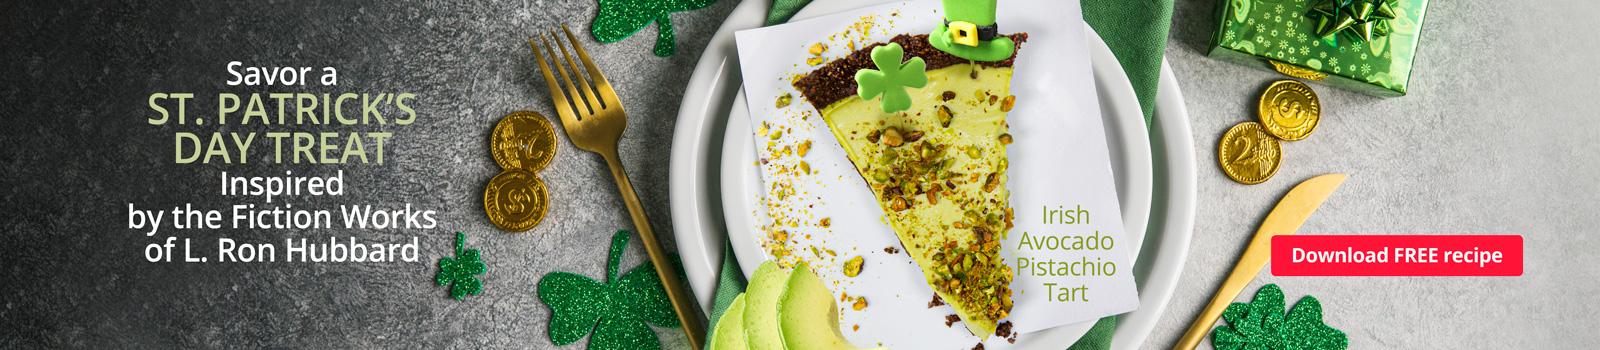 Savor a St. Patrick's Day Treat